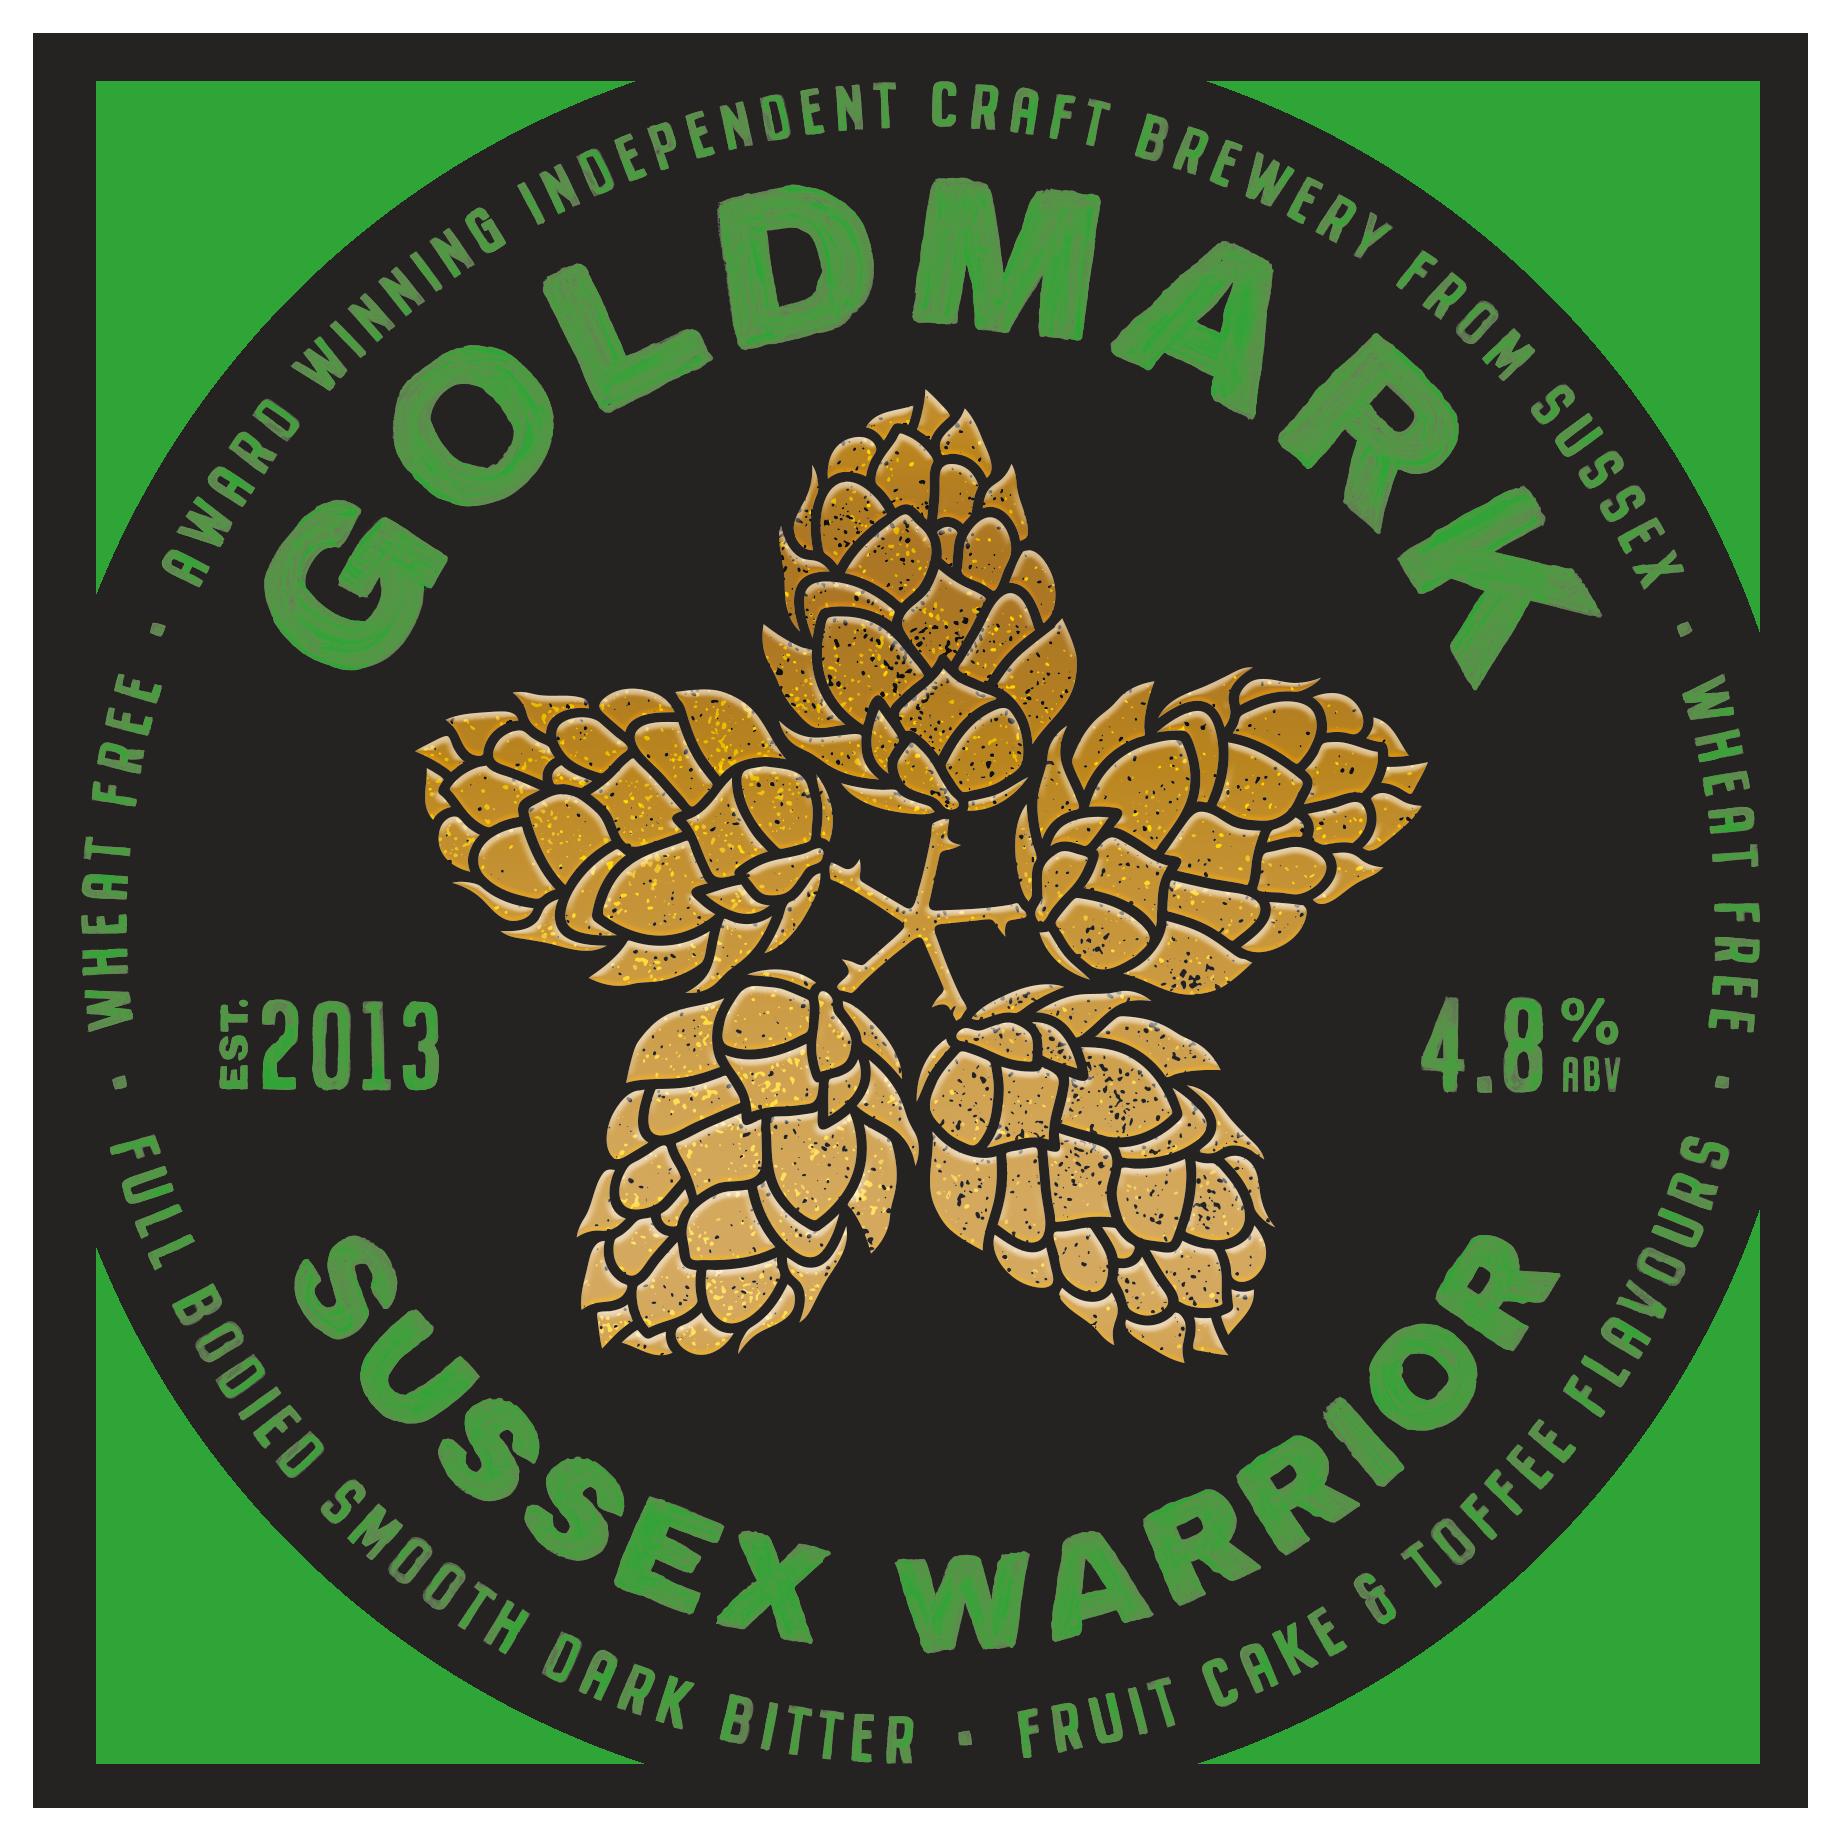 Goldmark Sussex Warrior